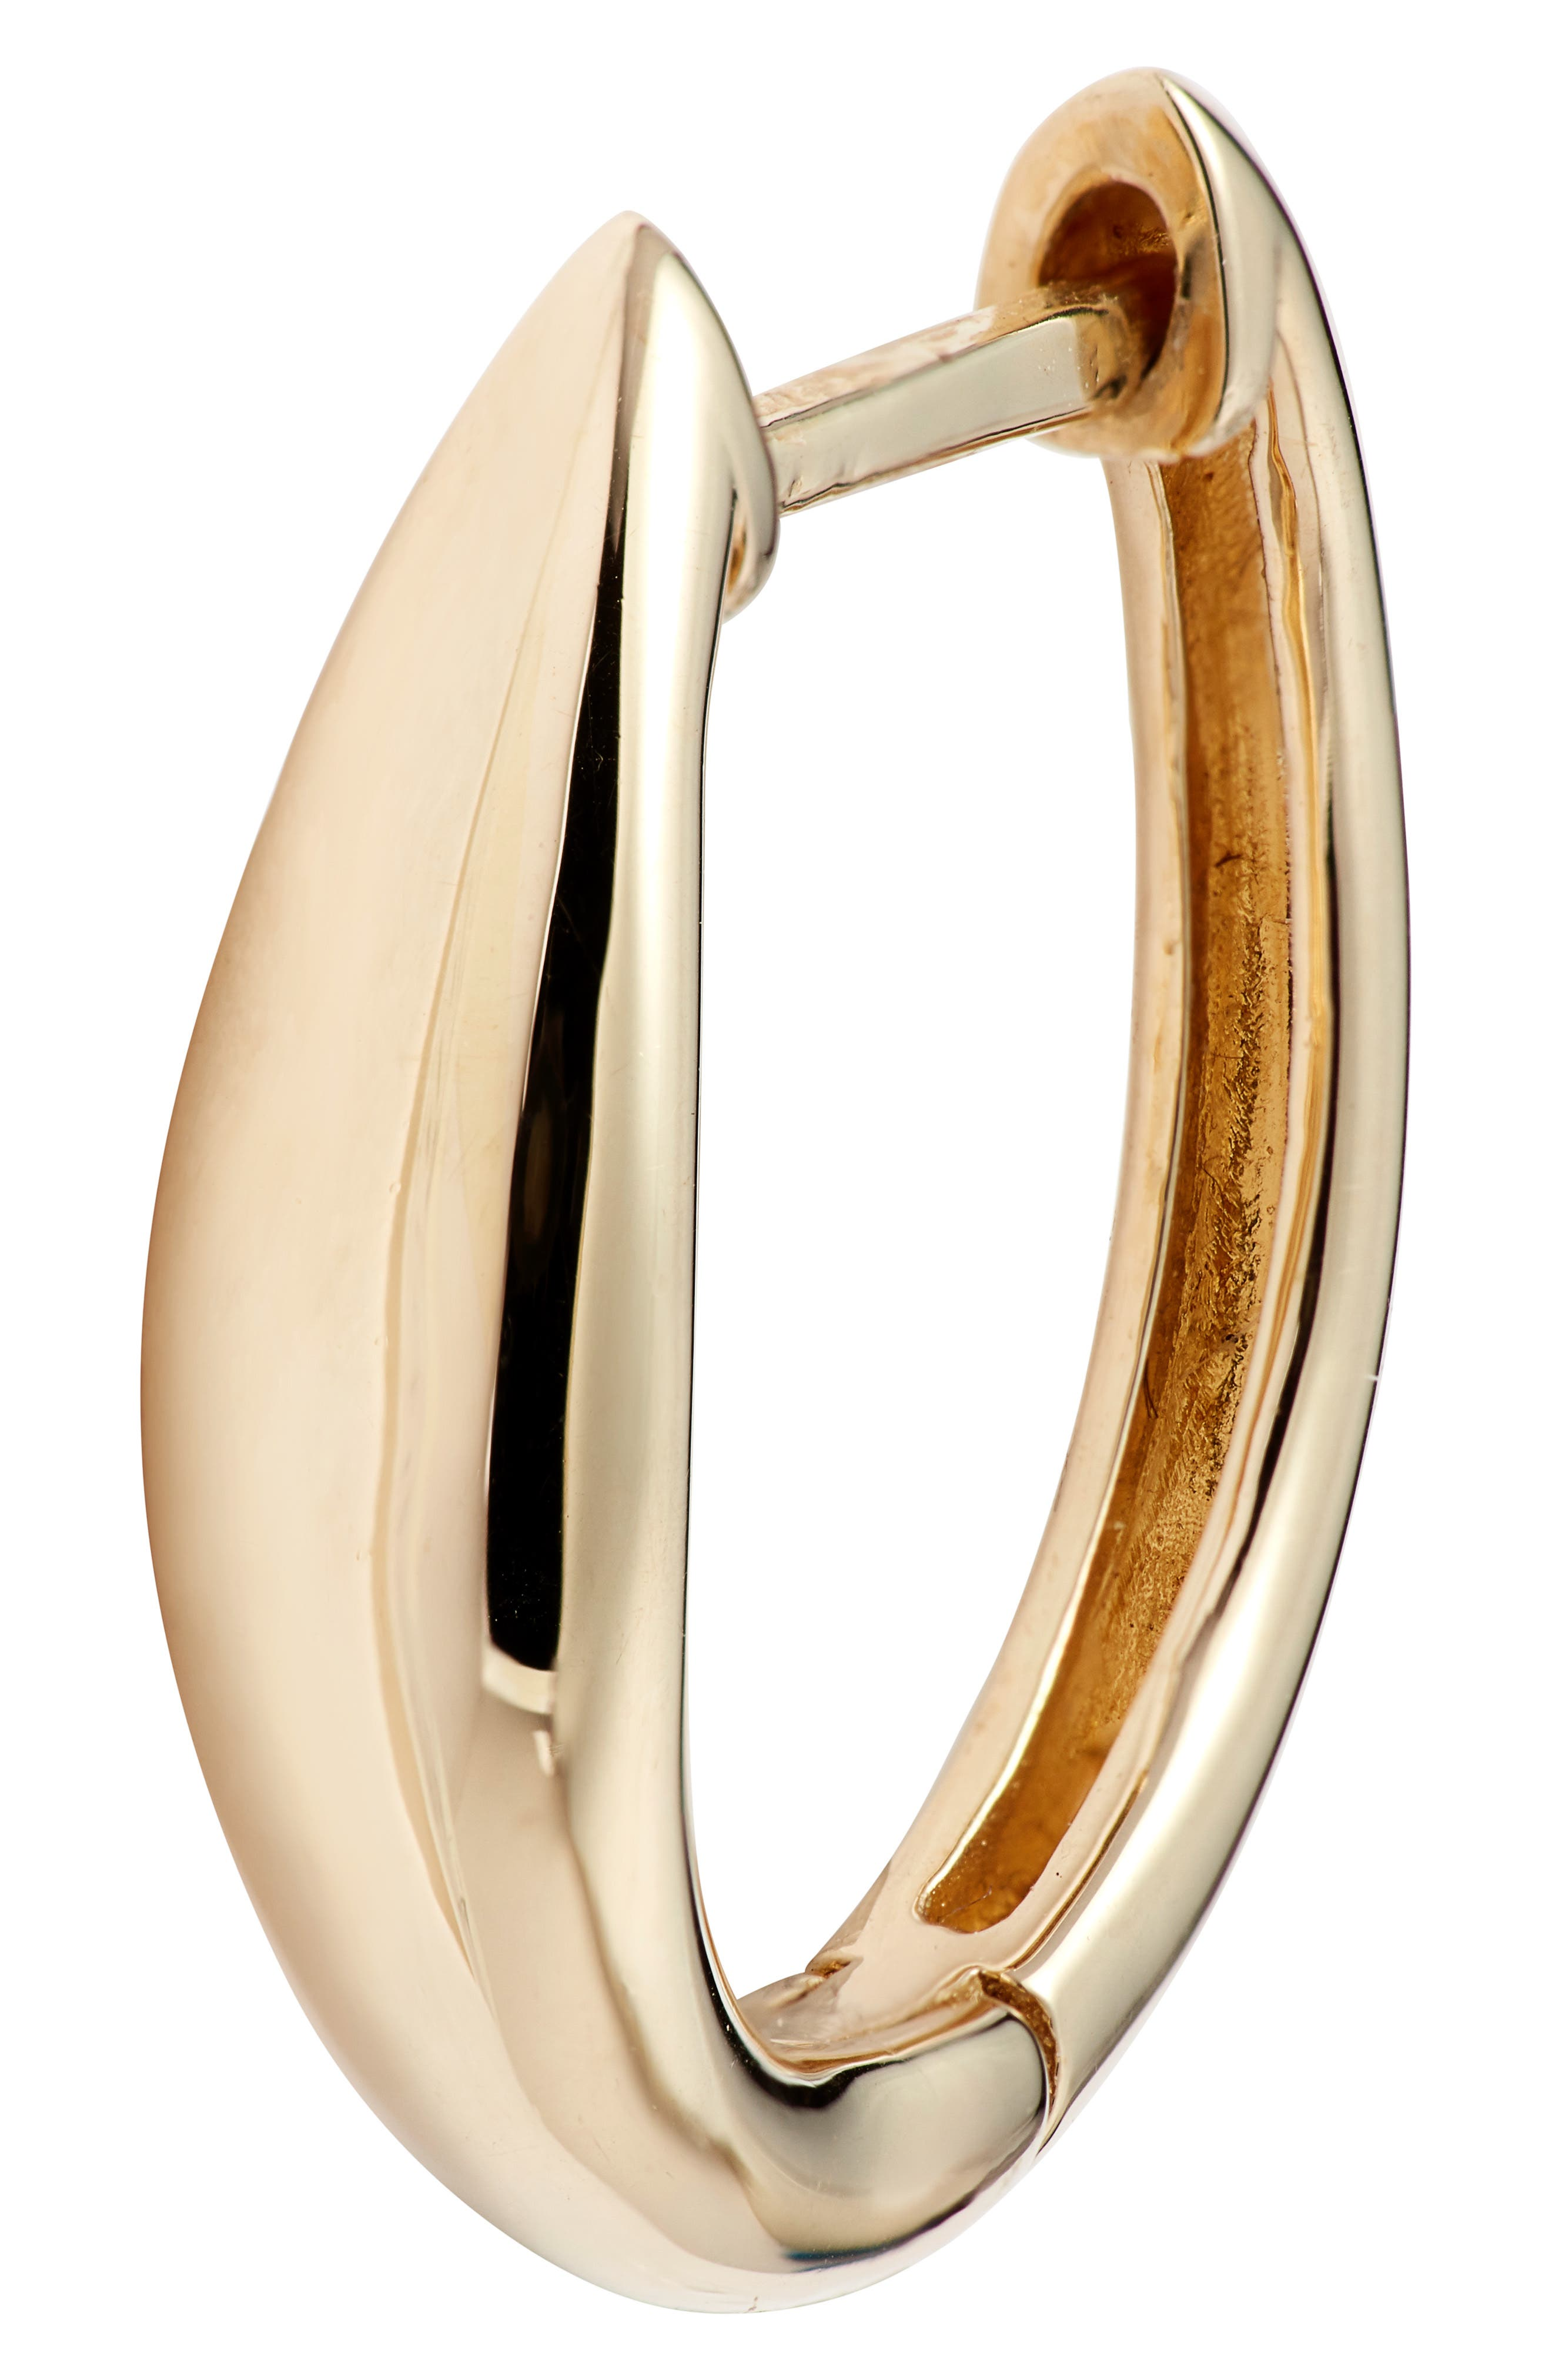 BONY LEVY,                             14K Gold Hoop Earrings,                             Alternate thumbnail 5, color,                             YELLOW GOLD/ DIA